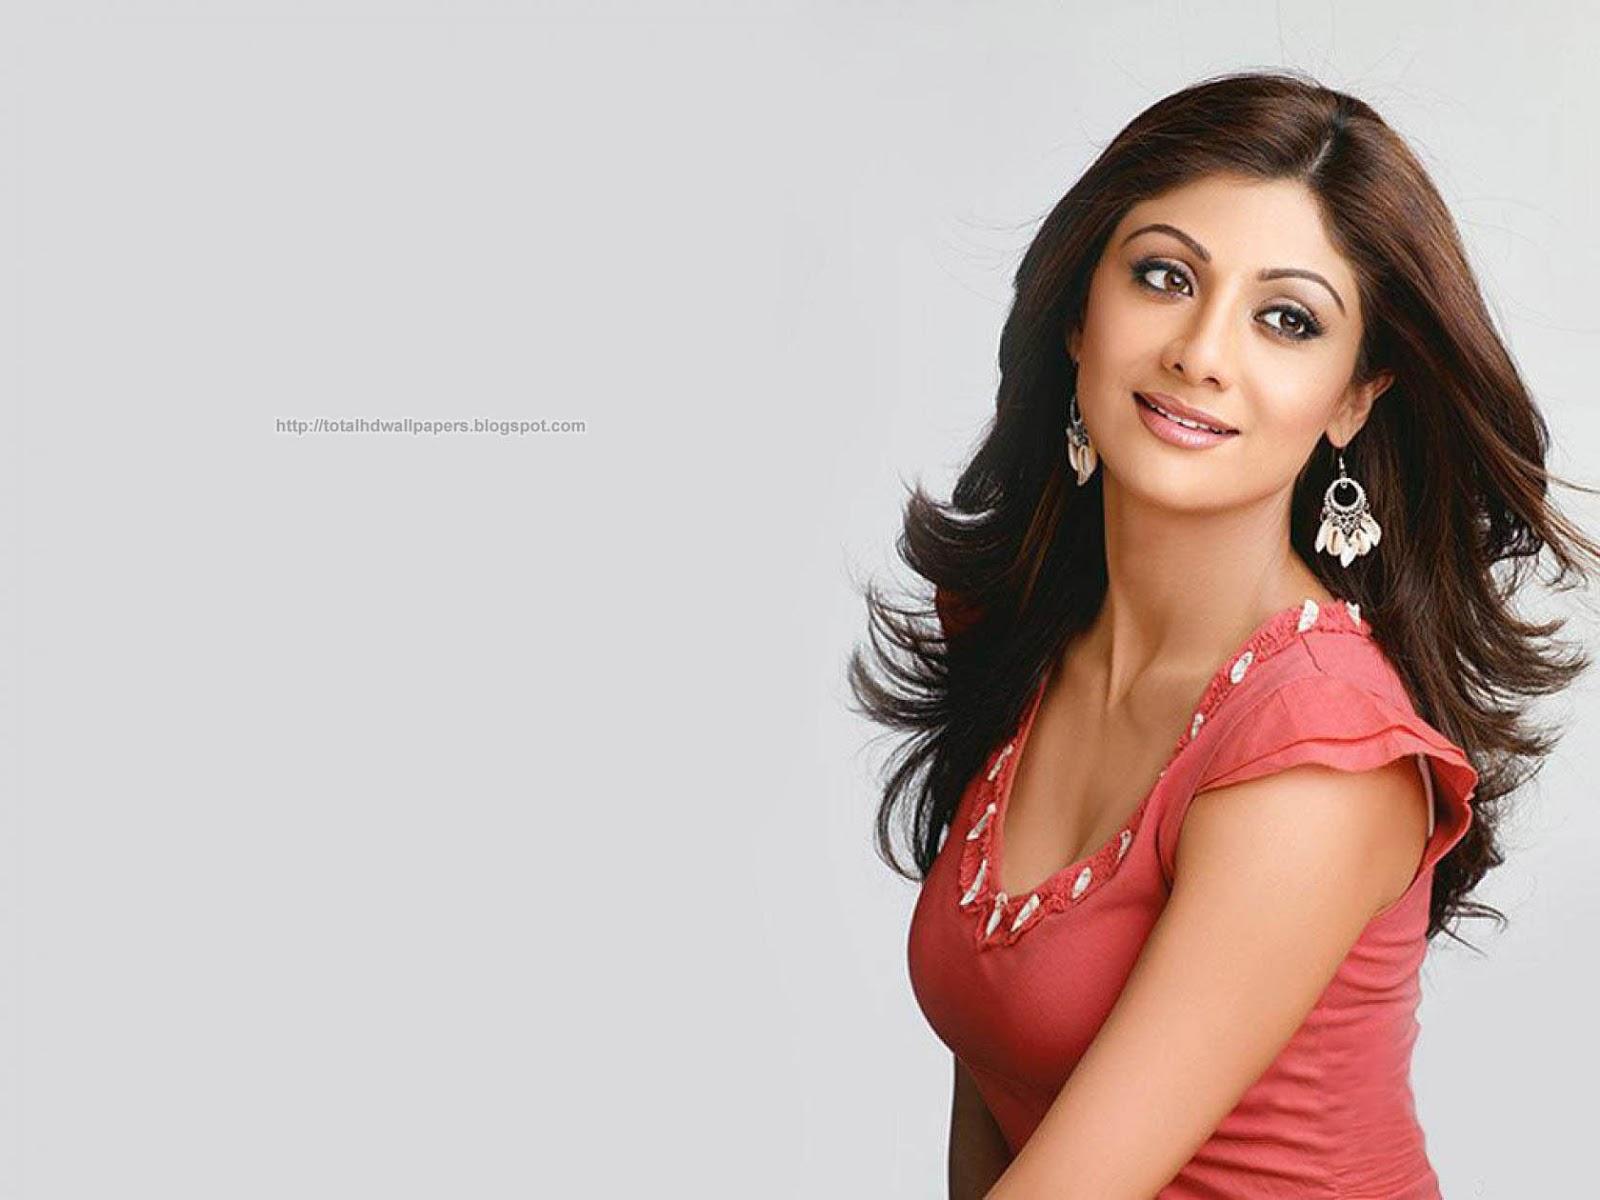 bollywood actress wallpapers - photo #45